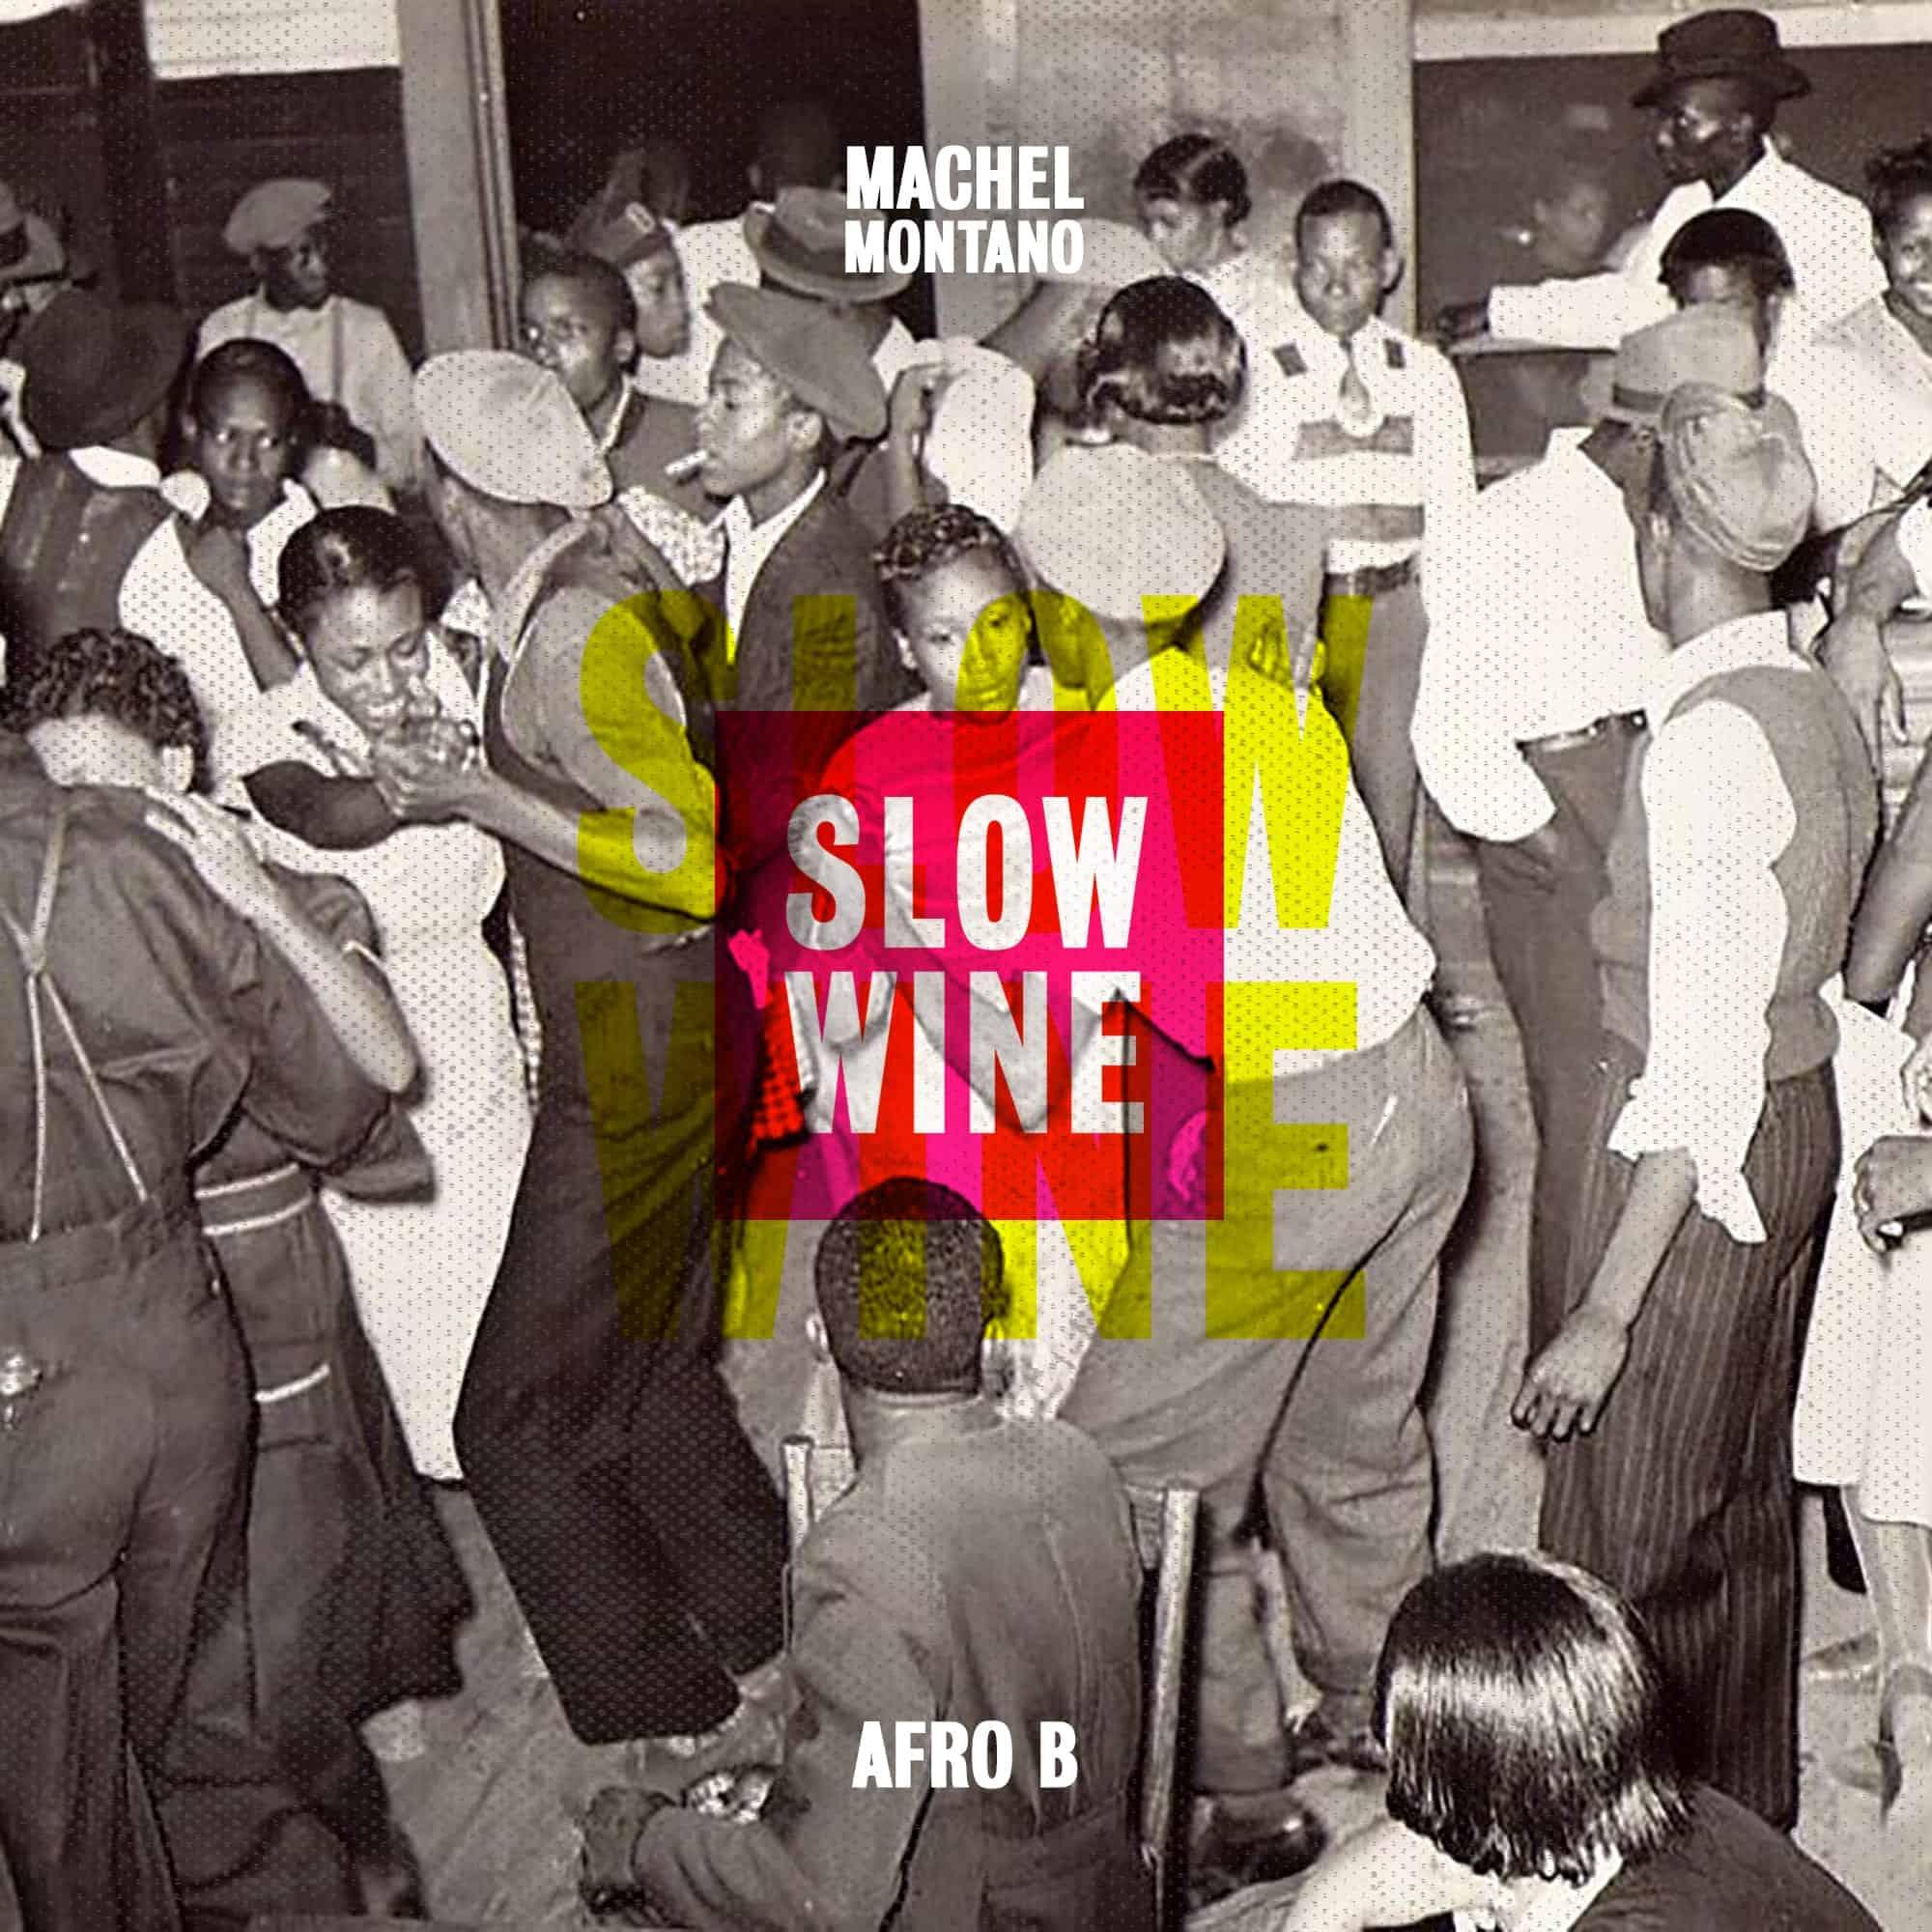 Slow Wine - Machel Montano & Afro B